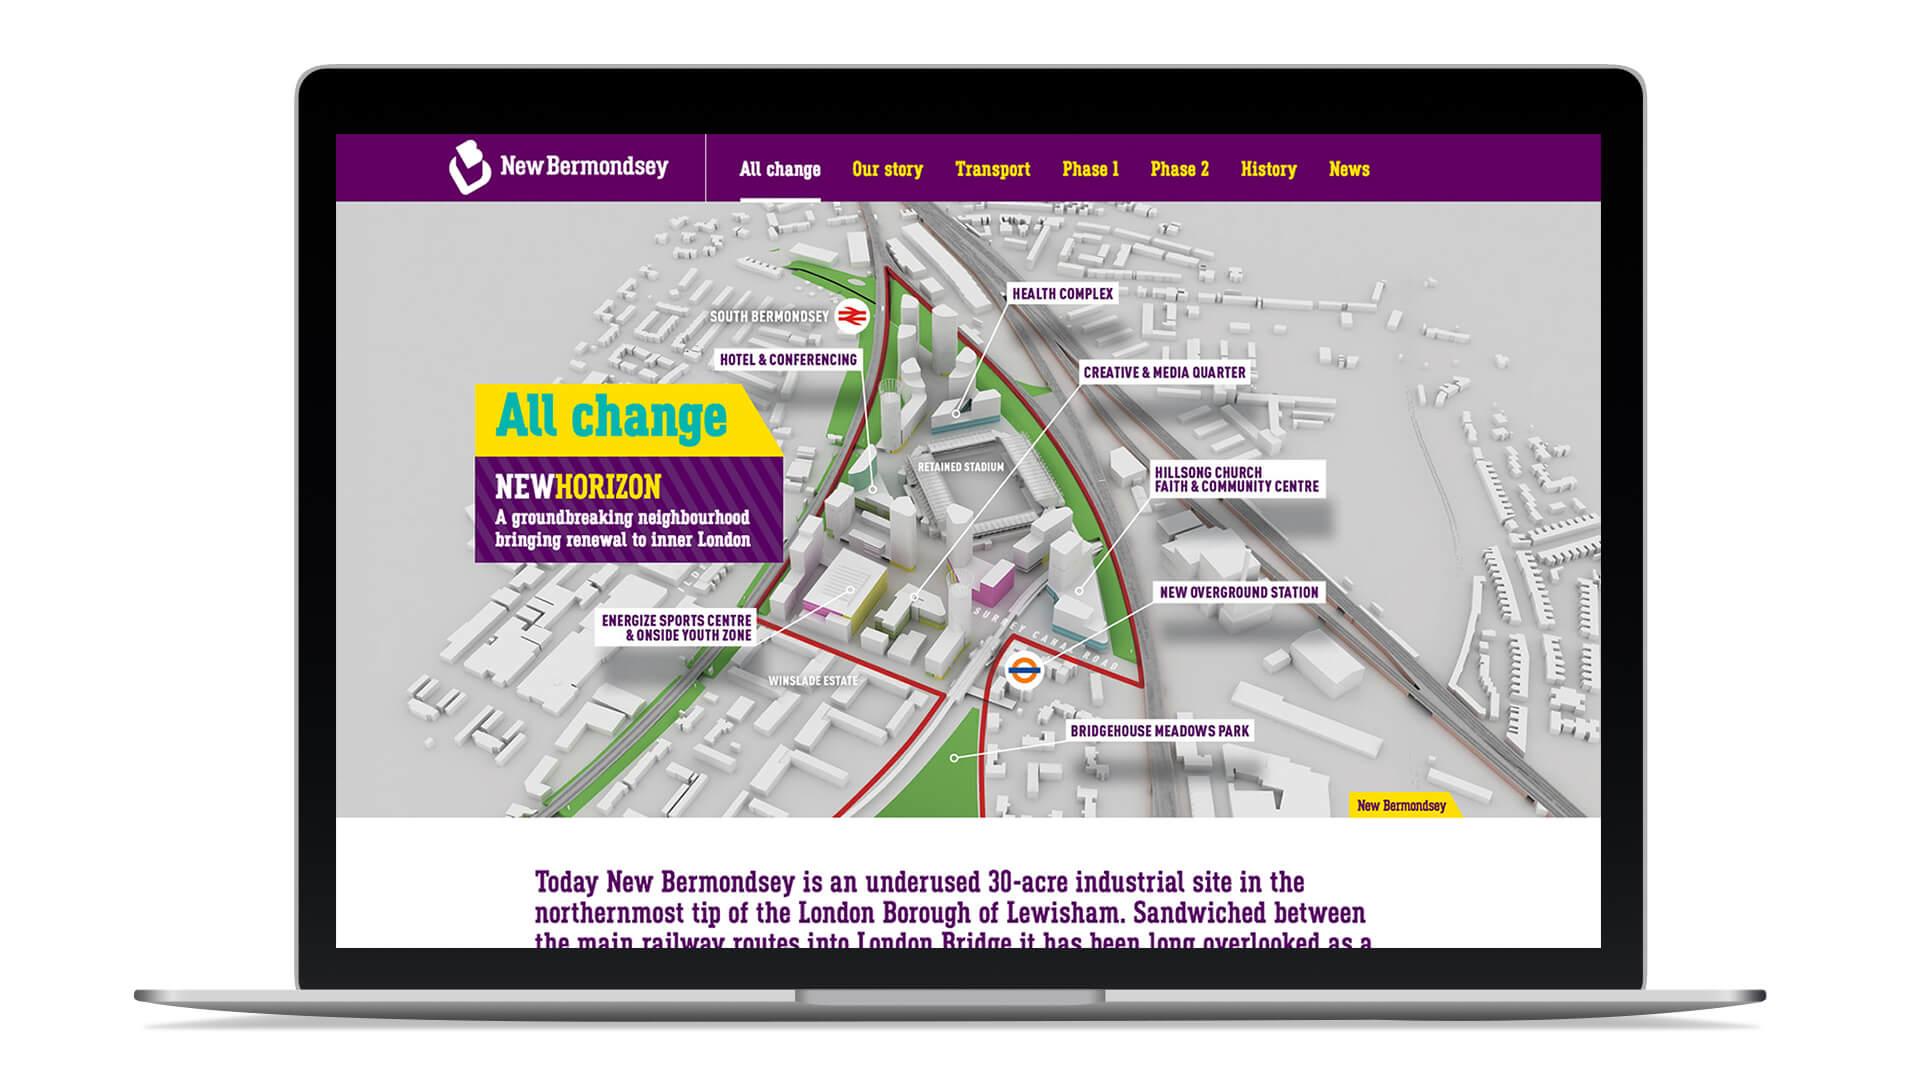 new bermondsey lobbying documents brochure design